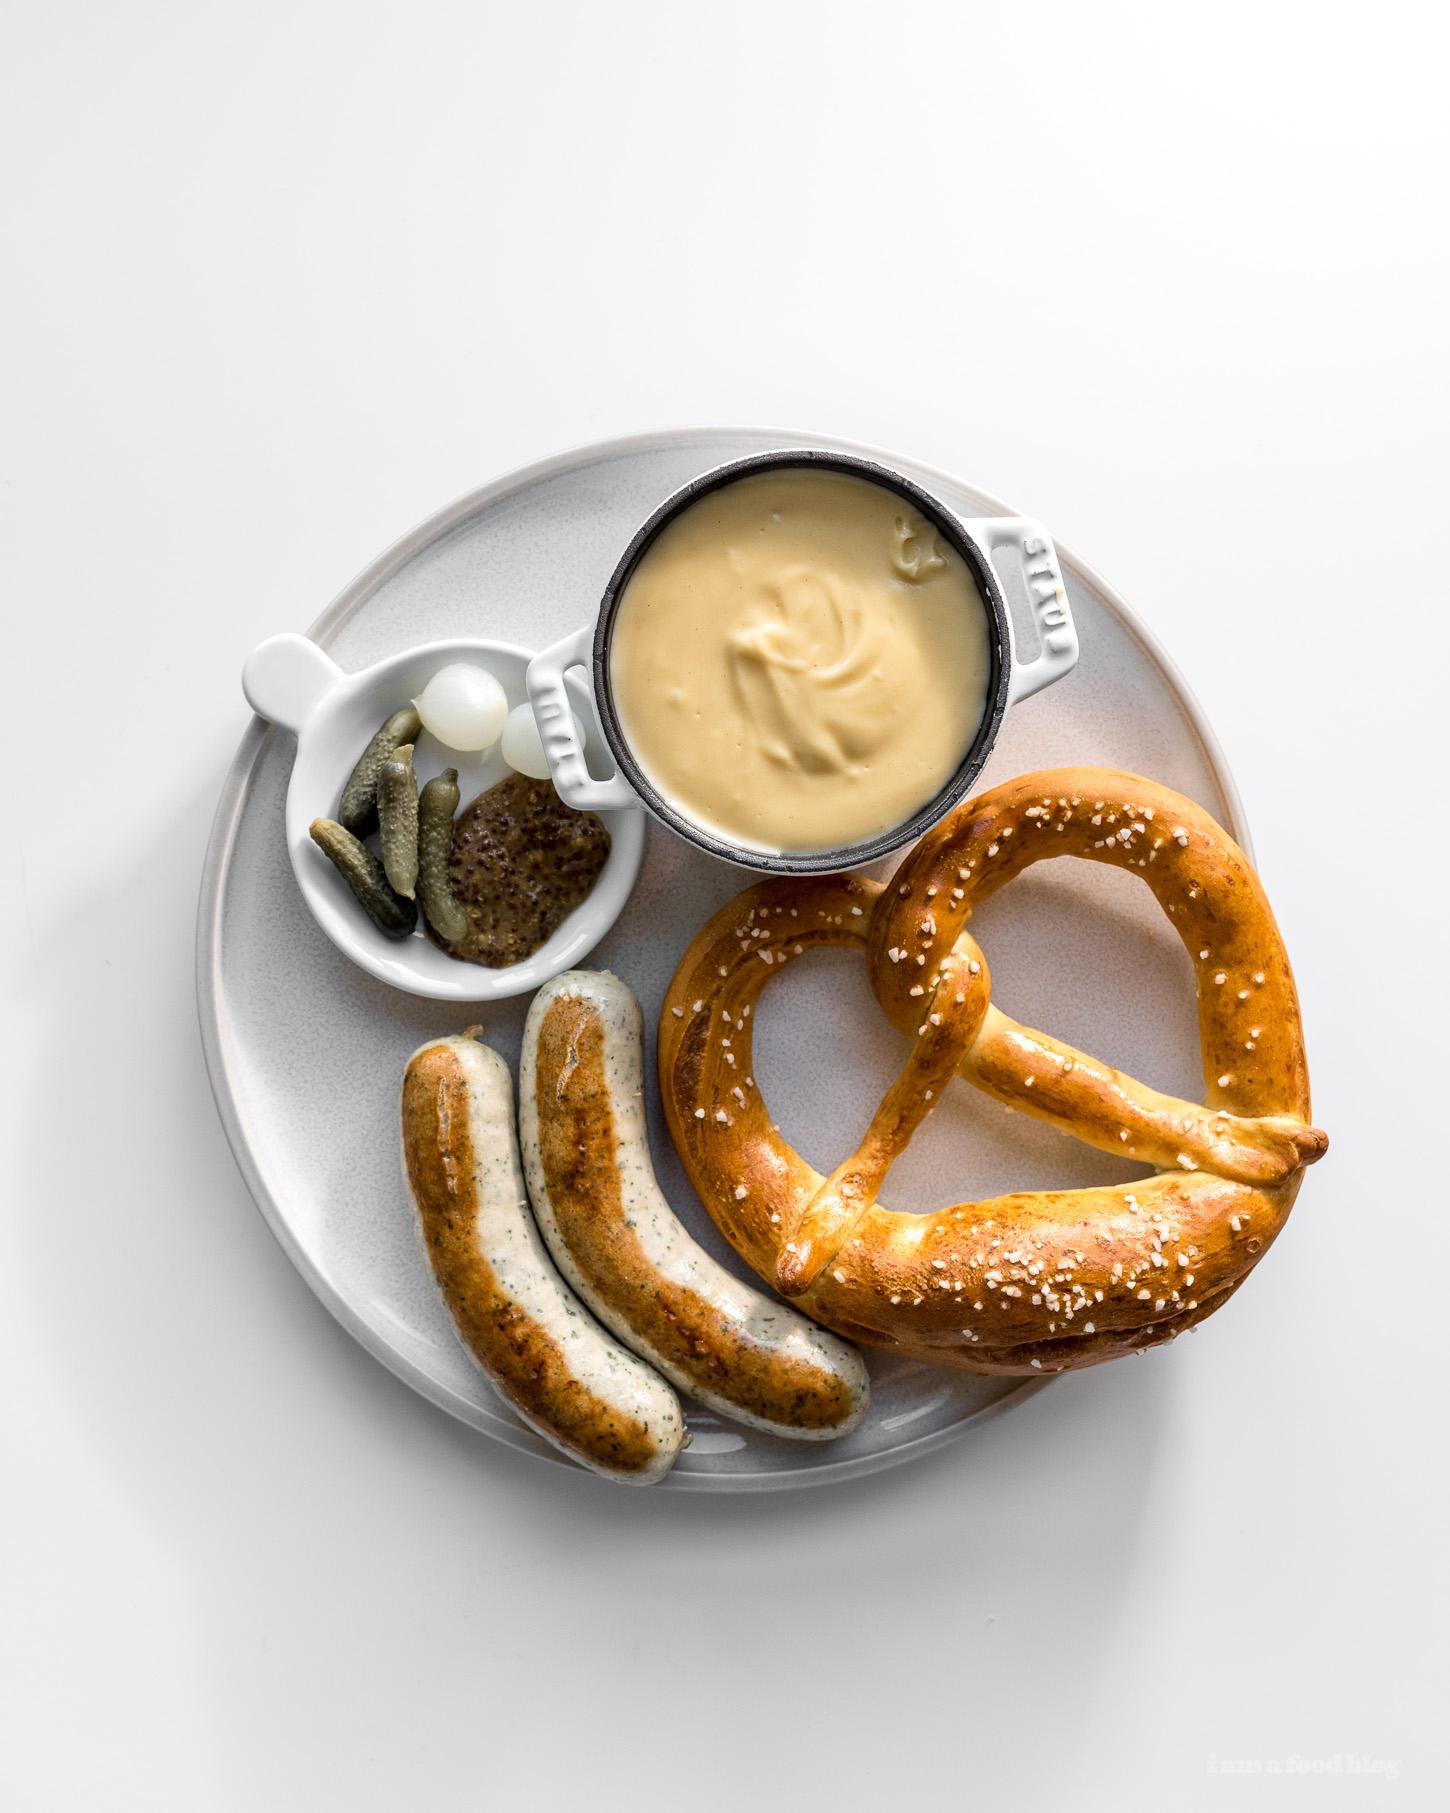 Receta tradicional alemana de pretzels suaves - www.iamafoodblog.com